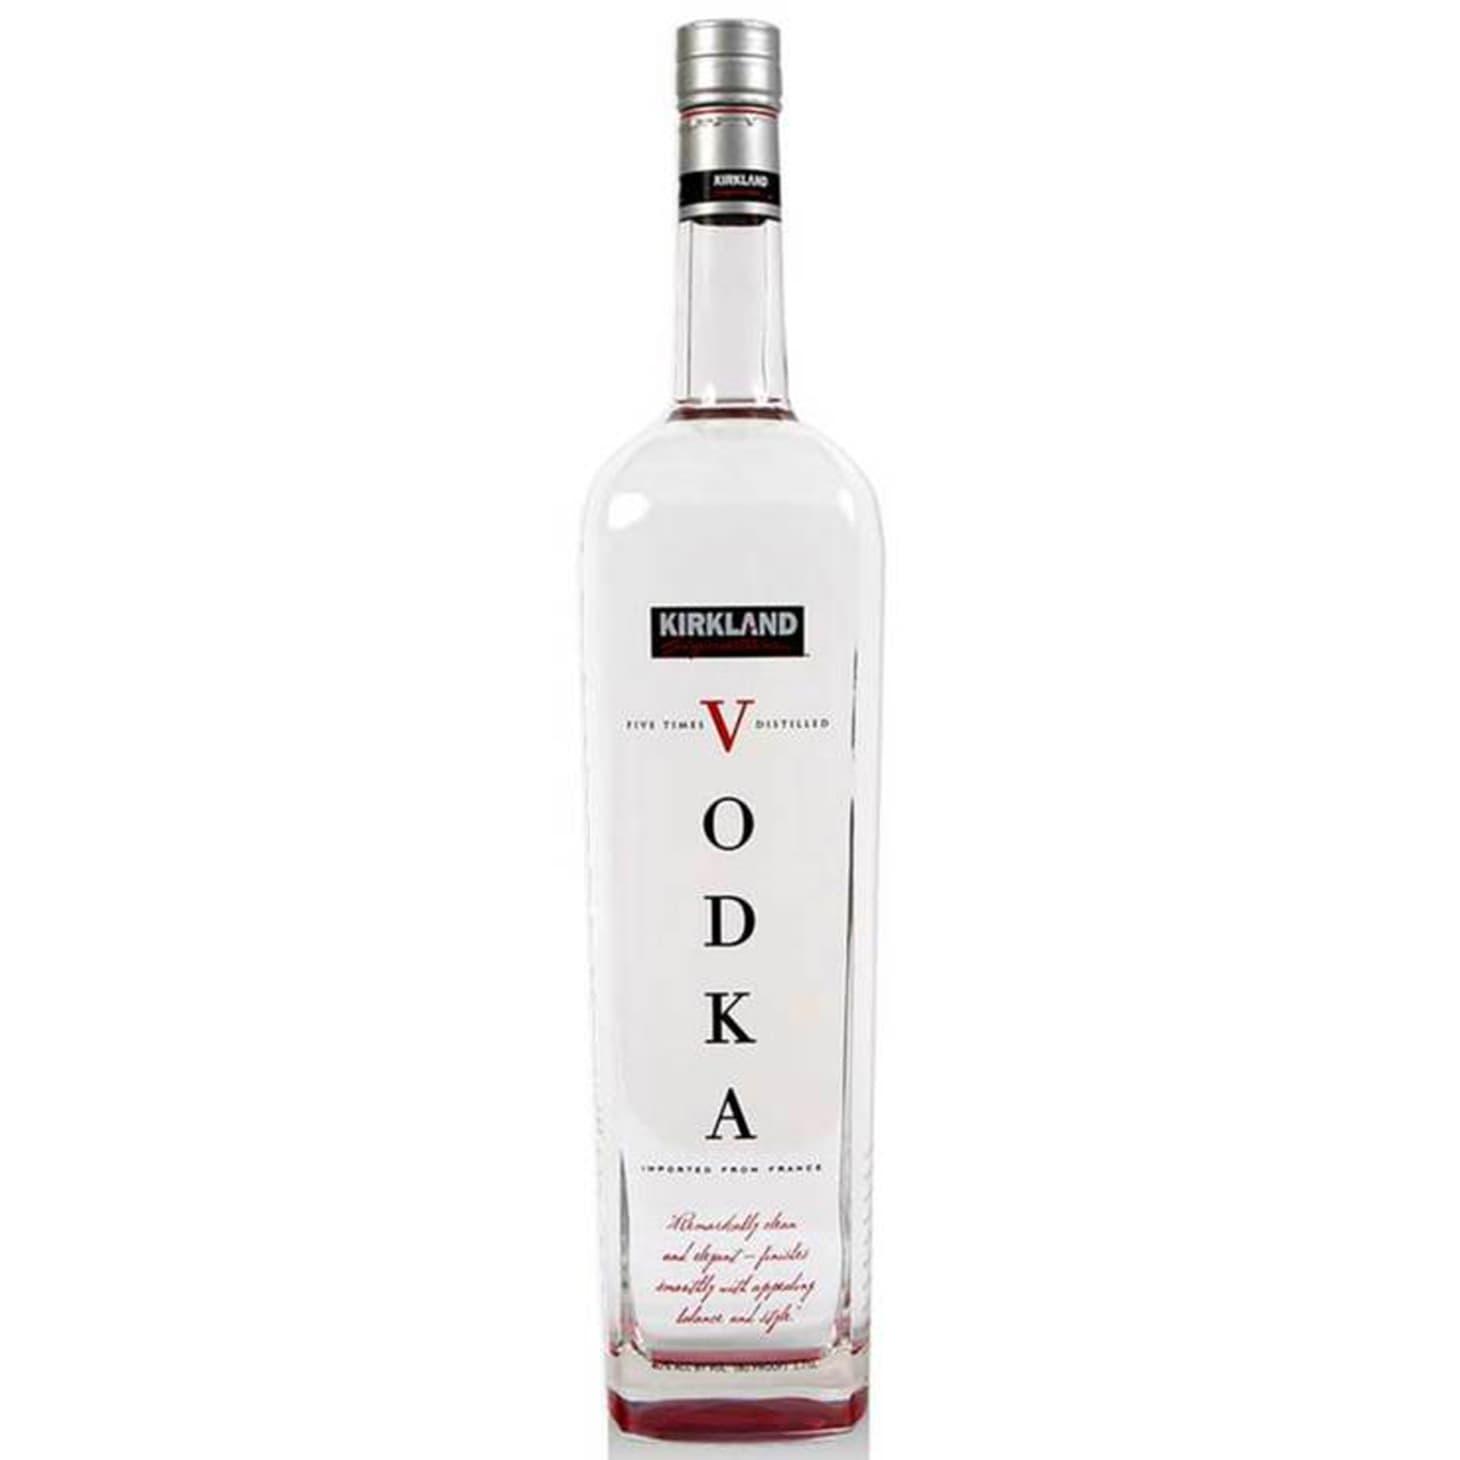 Costco Kirkland Vodka - Alcohol Booze Spirits | Kitchn